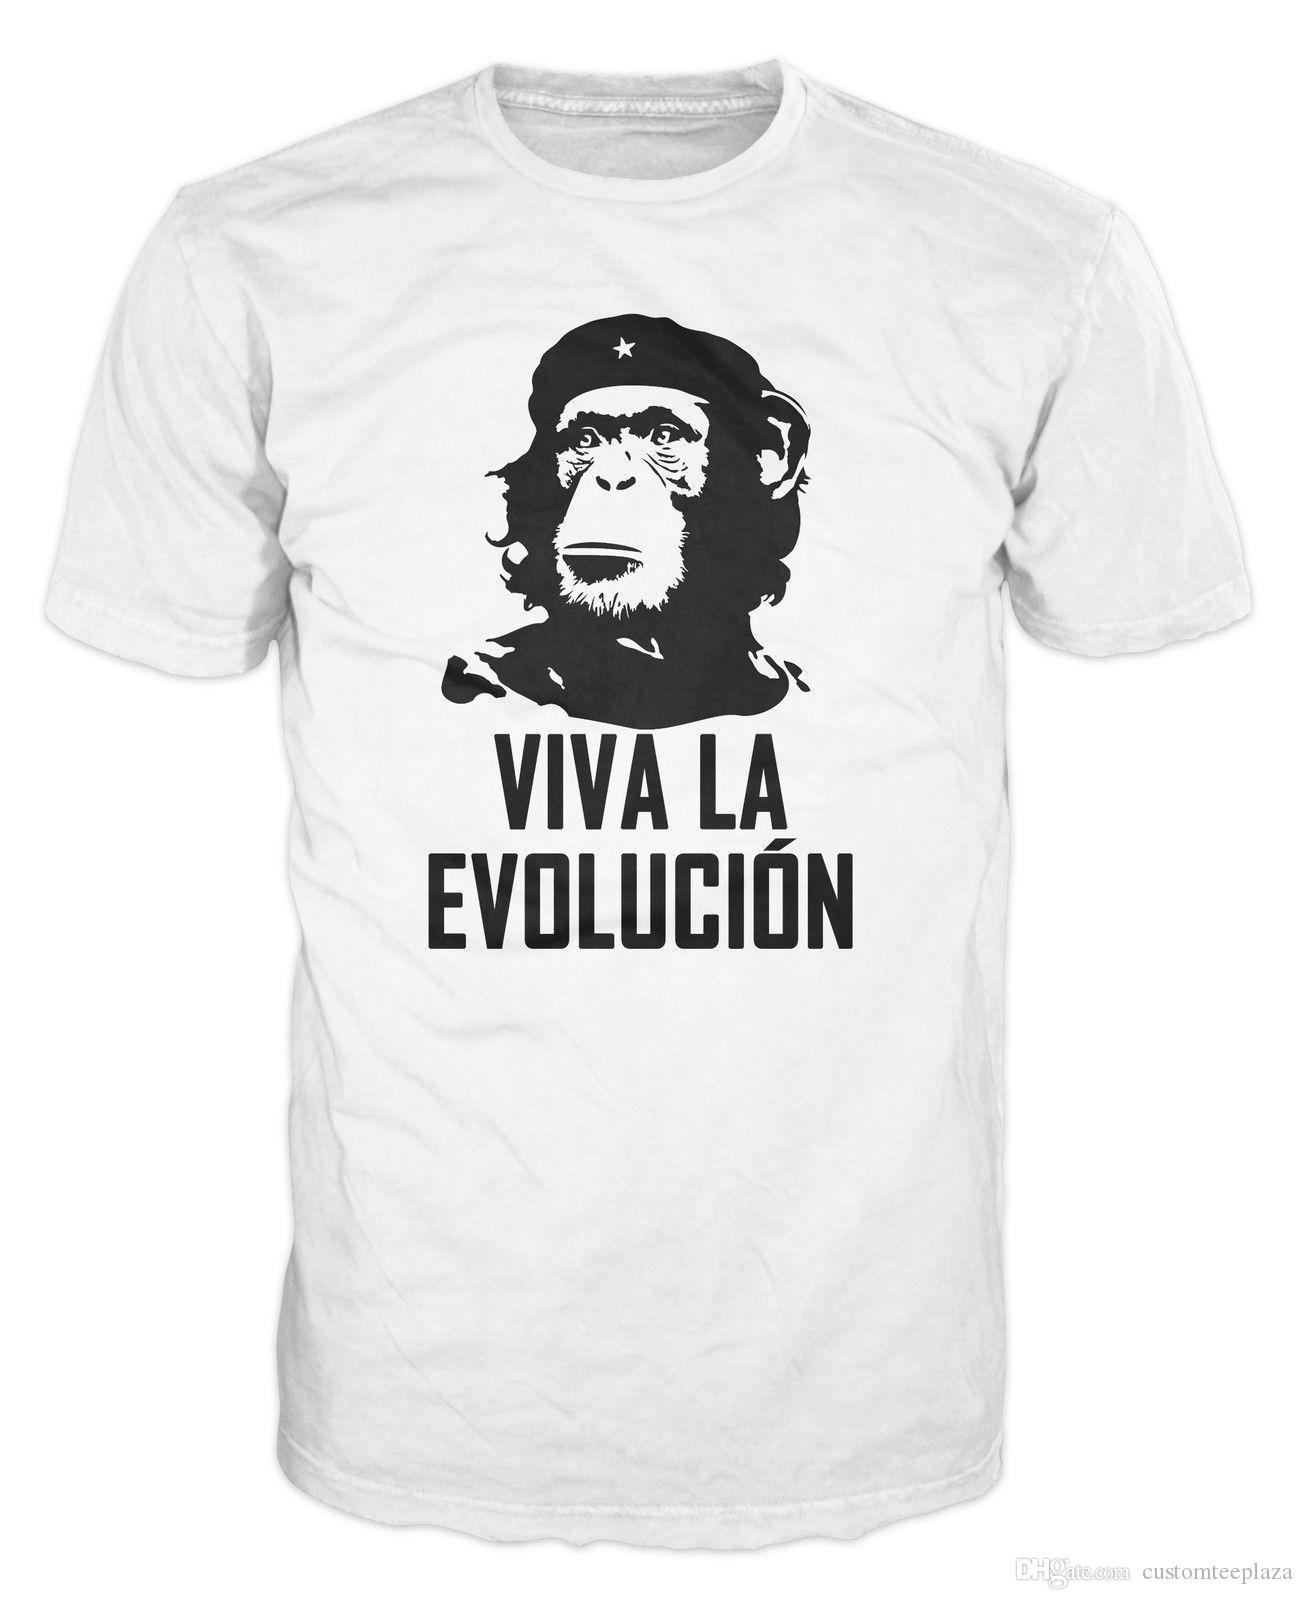 Viva La Evolucion Evolution Che Guevara Funny Monkey Hat Military T